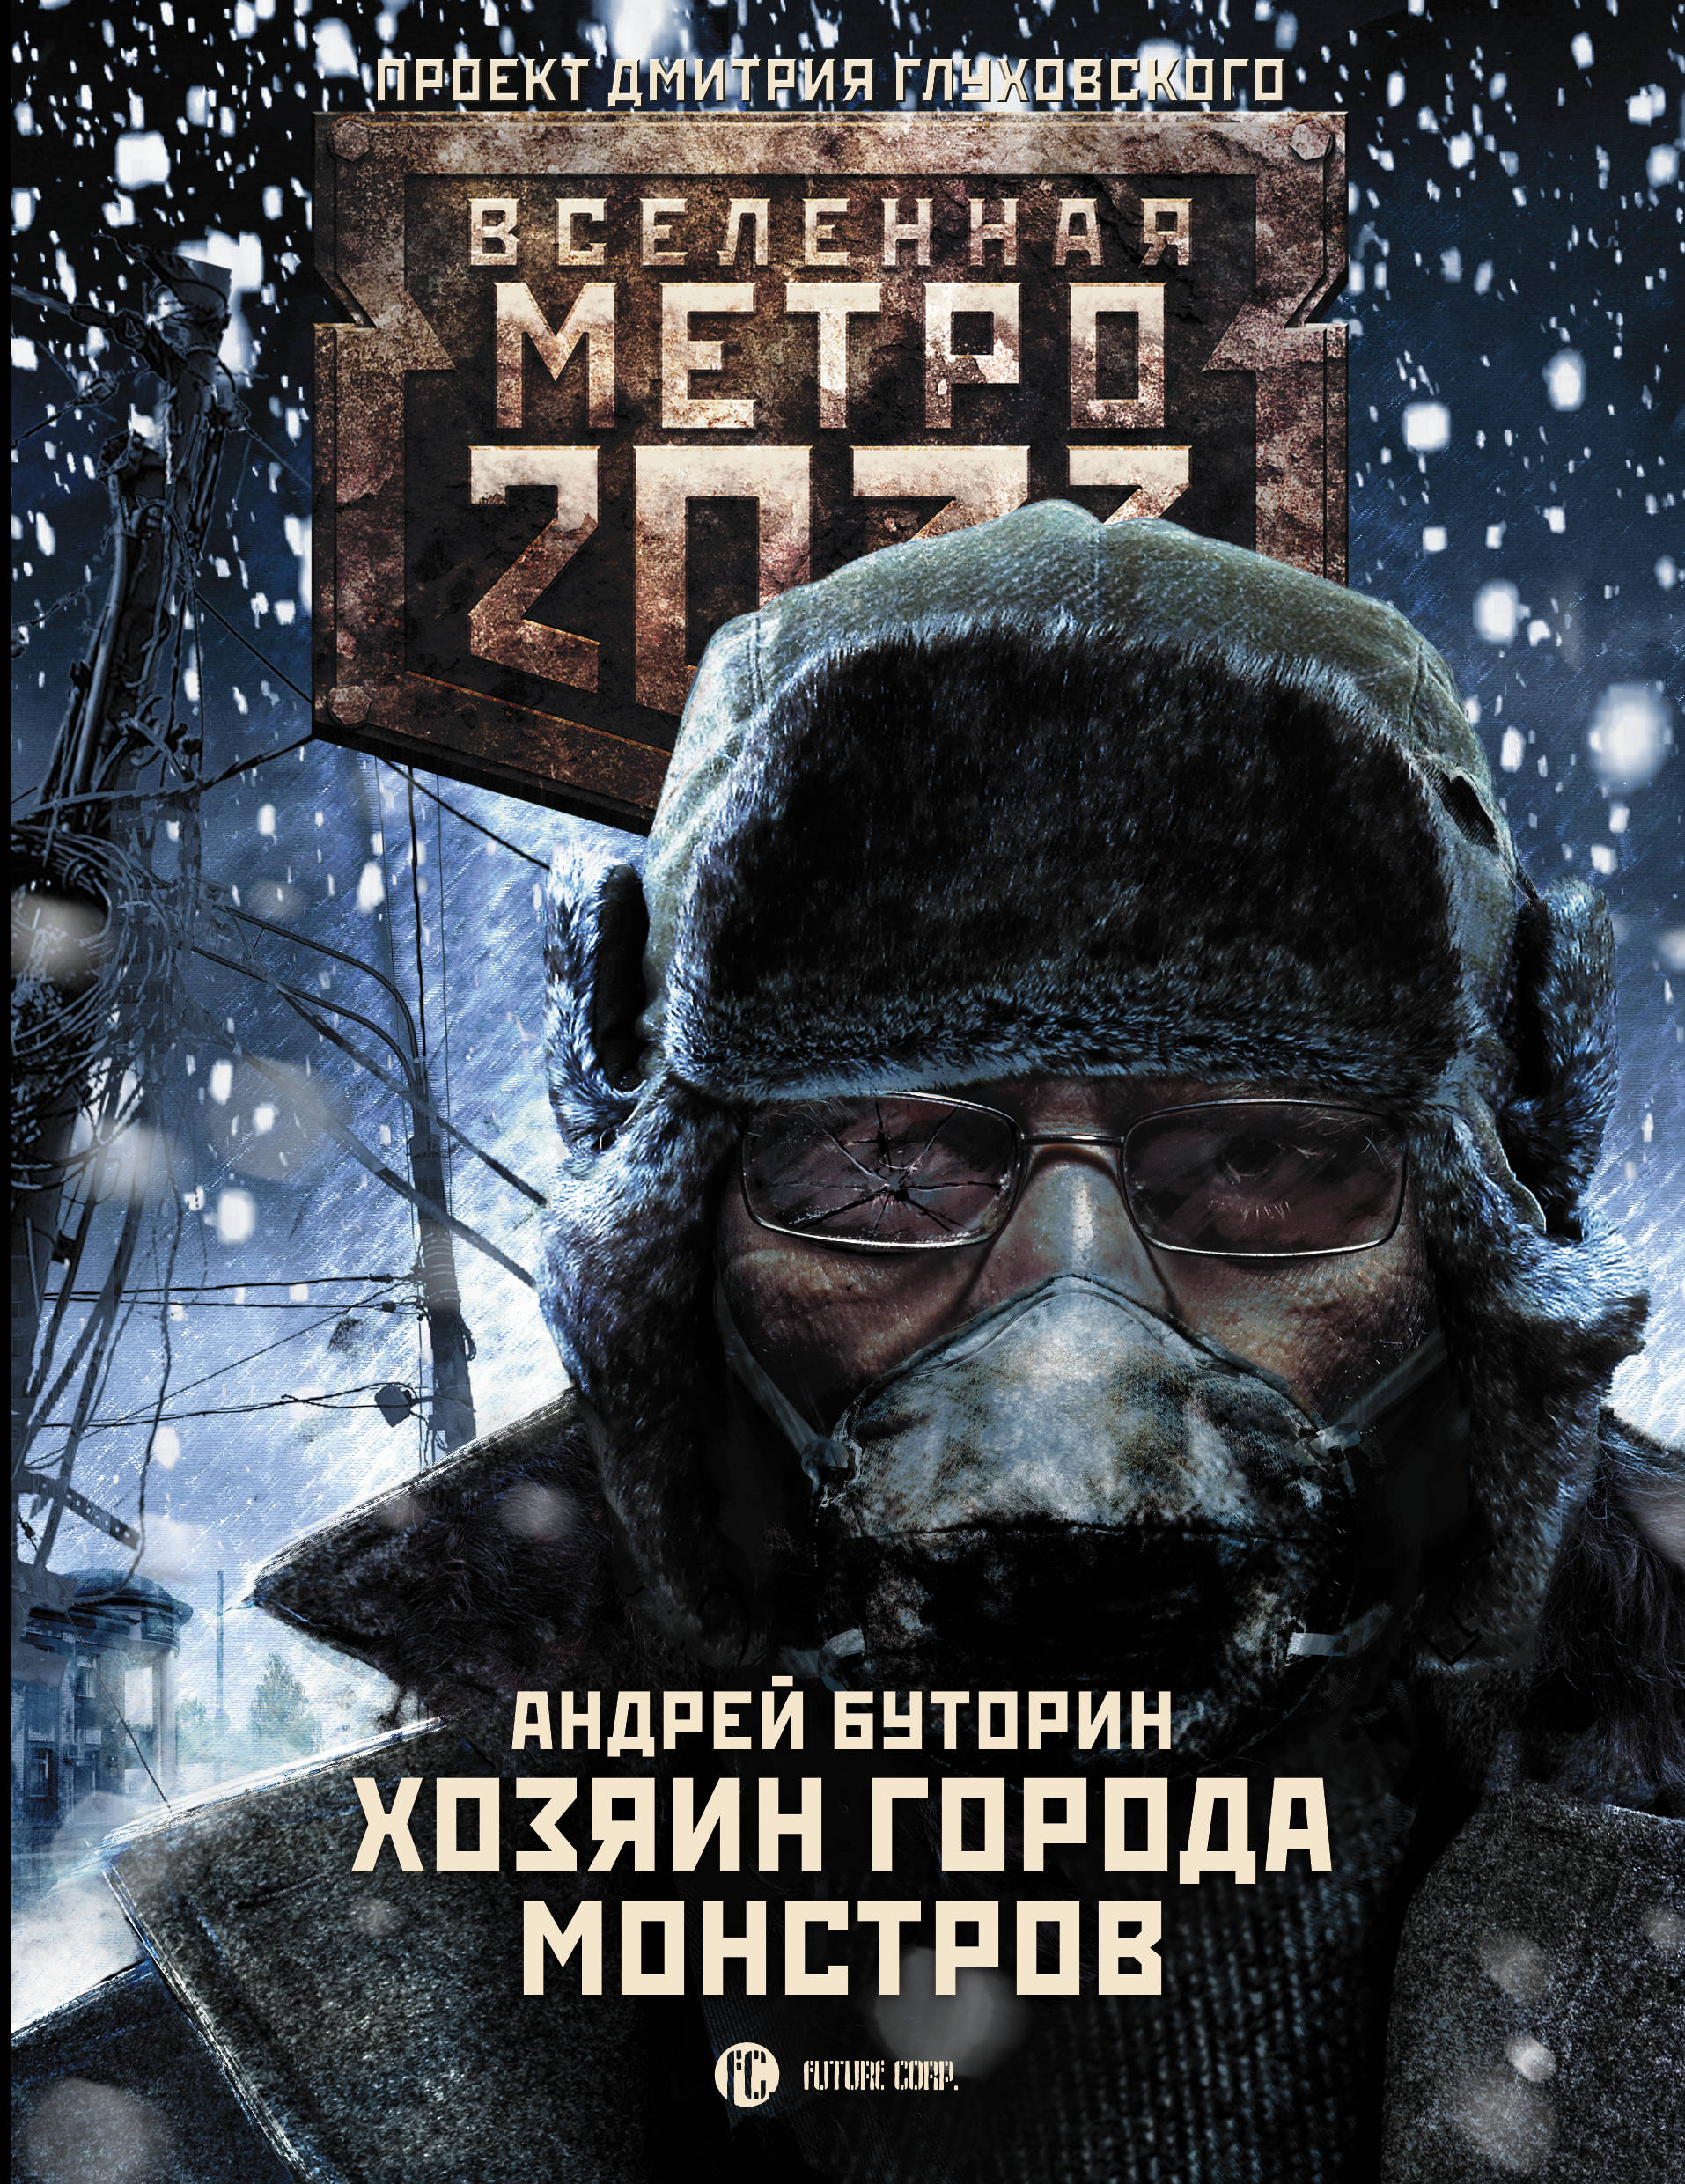 Буторин А.Р. Метро 2033: Хозяин города монстров игра для xbox one метро 2033 возвращение